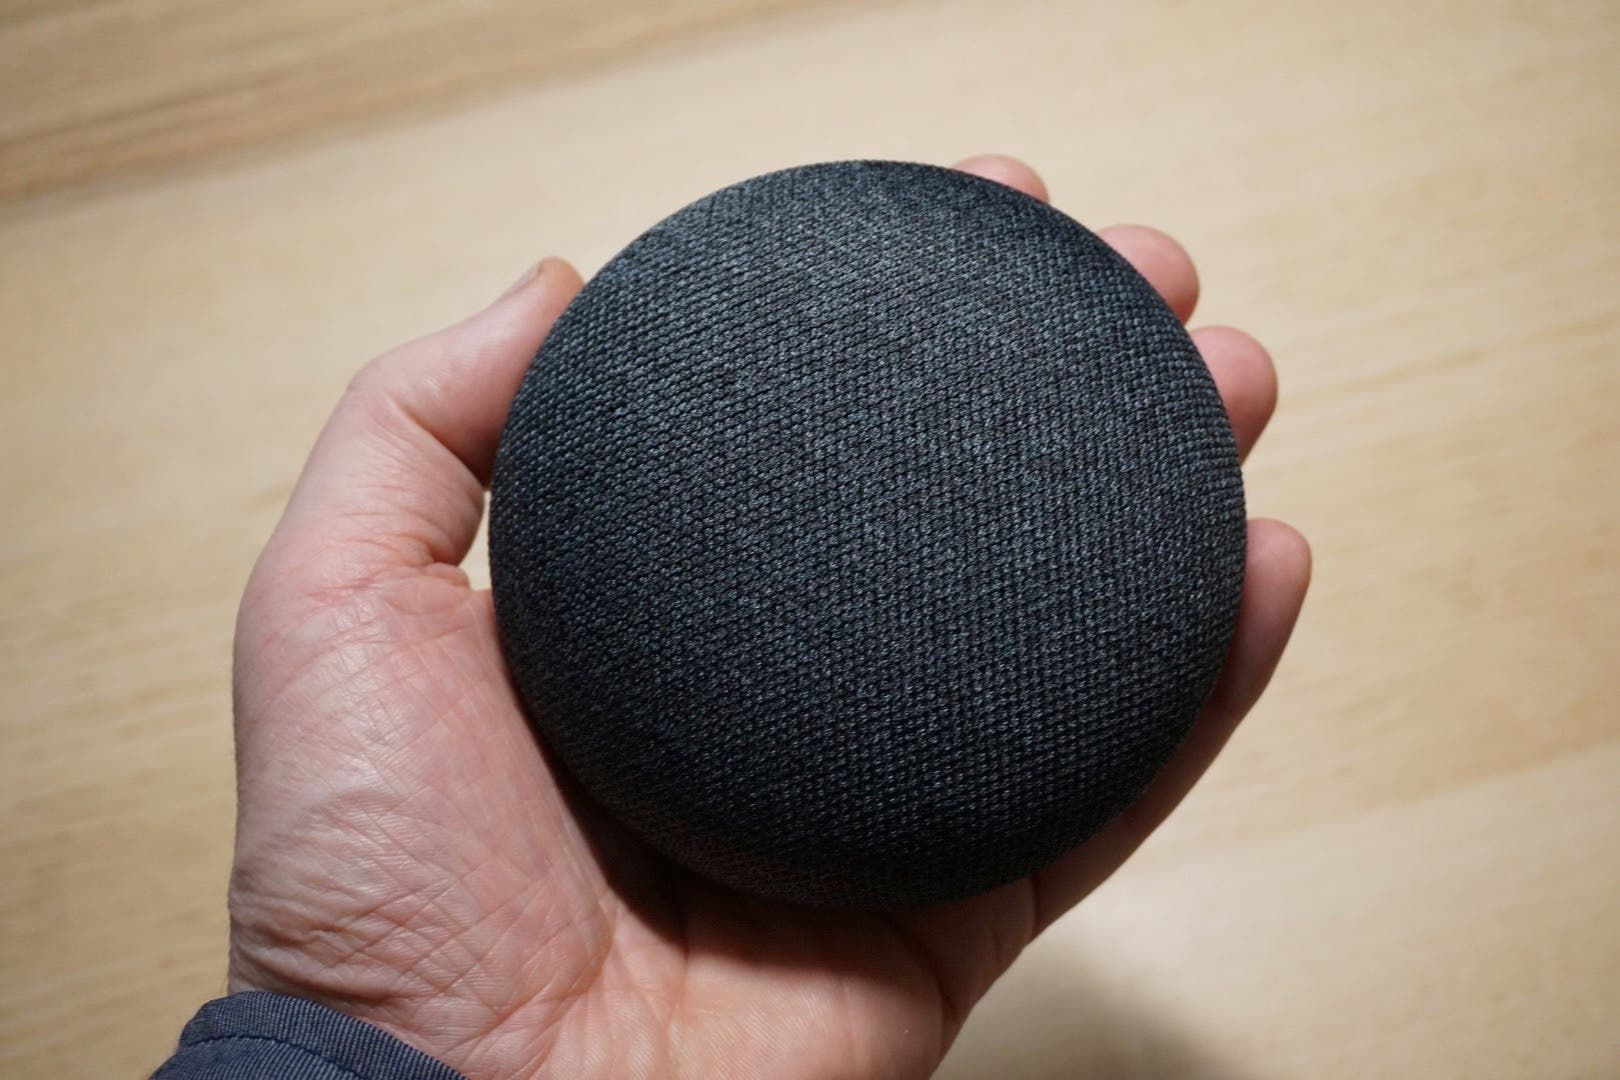 google home mini hands on